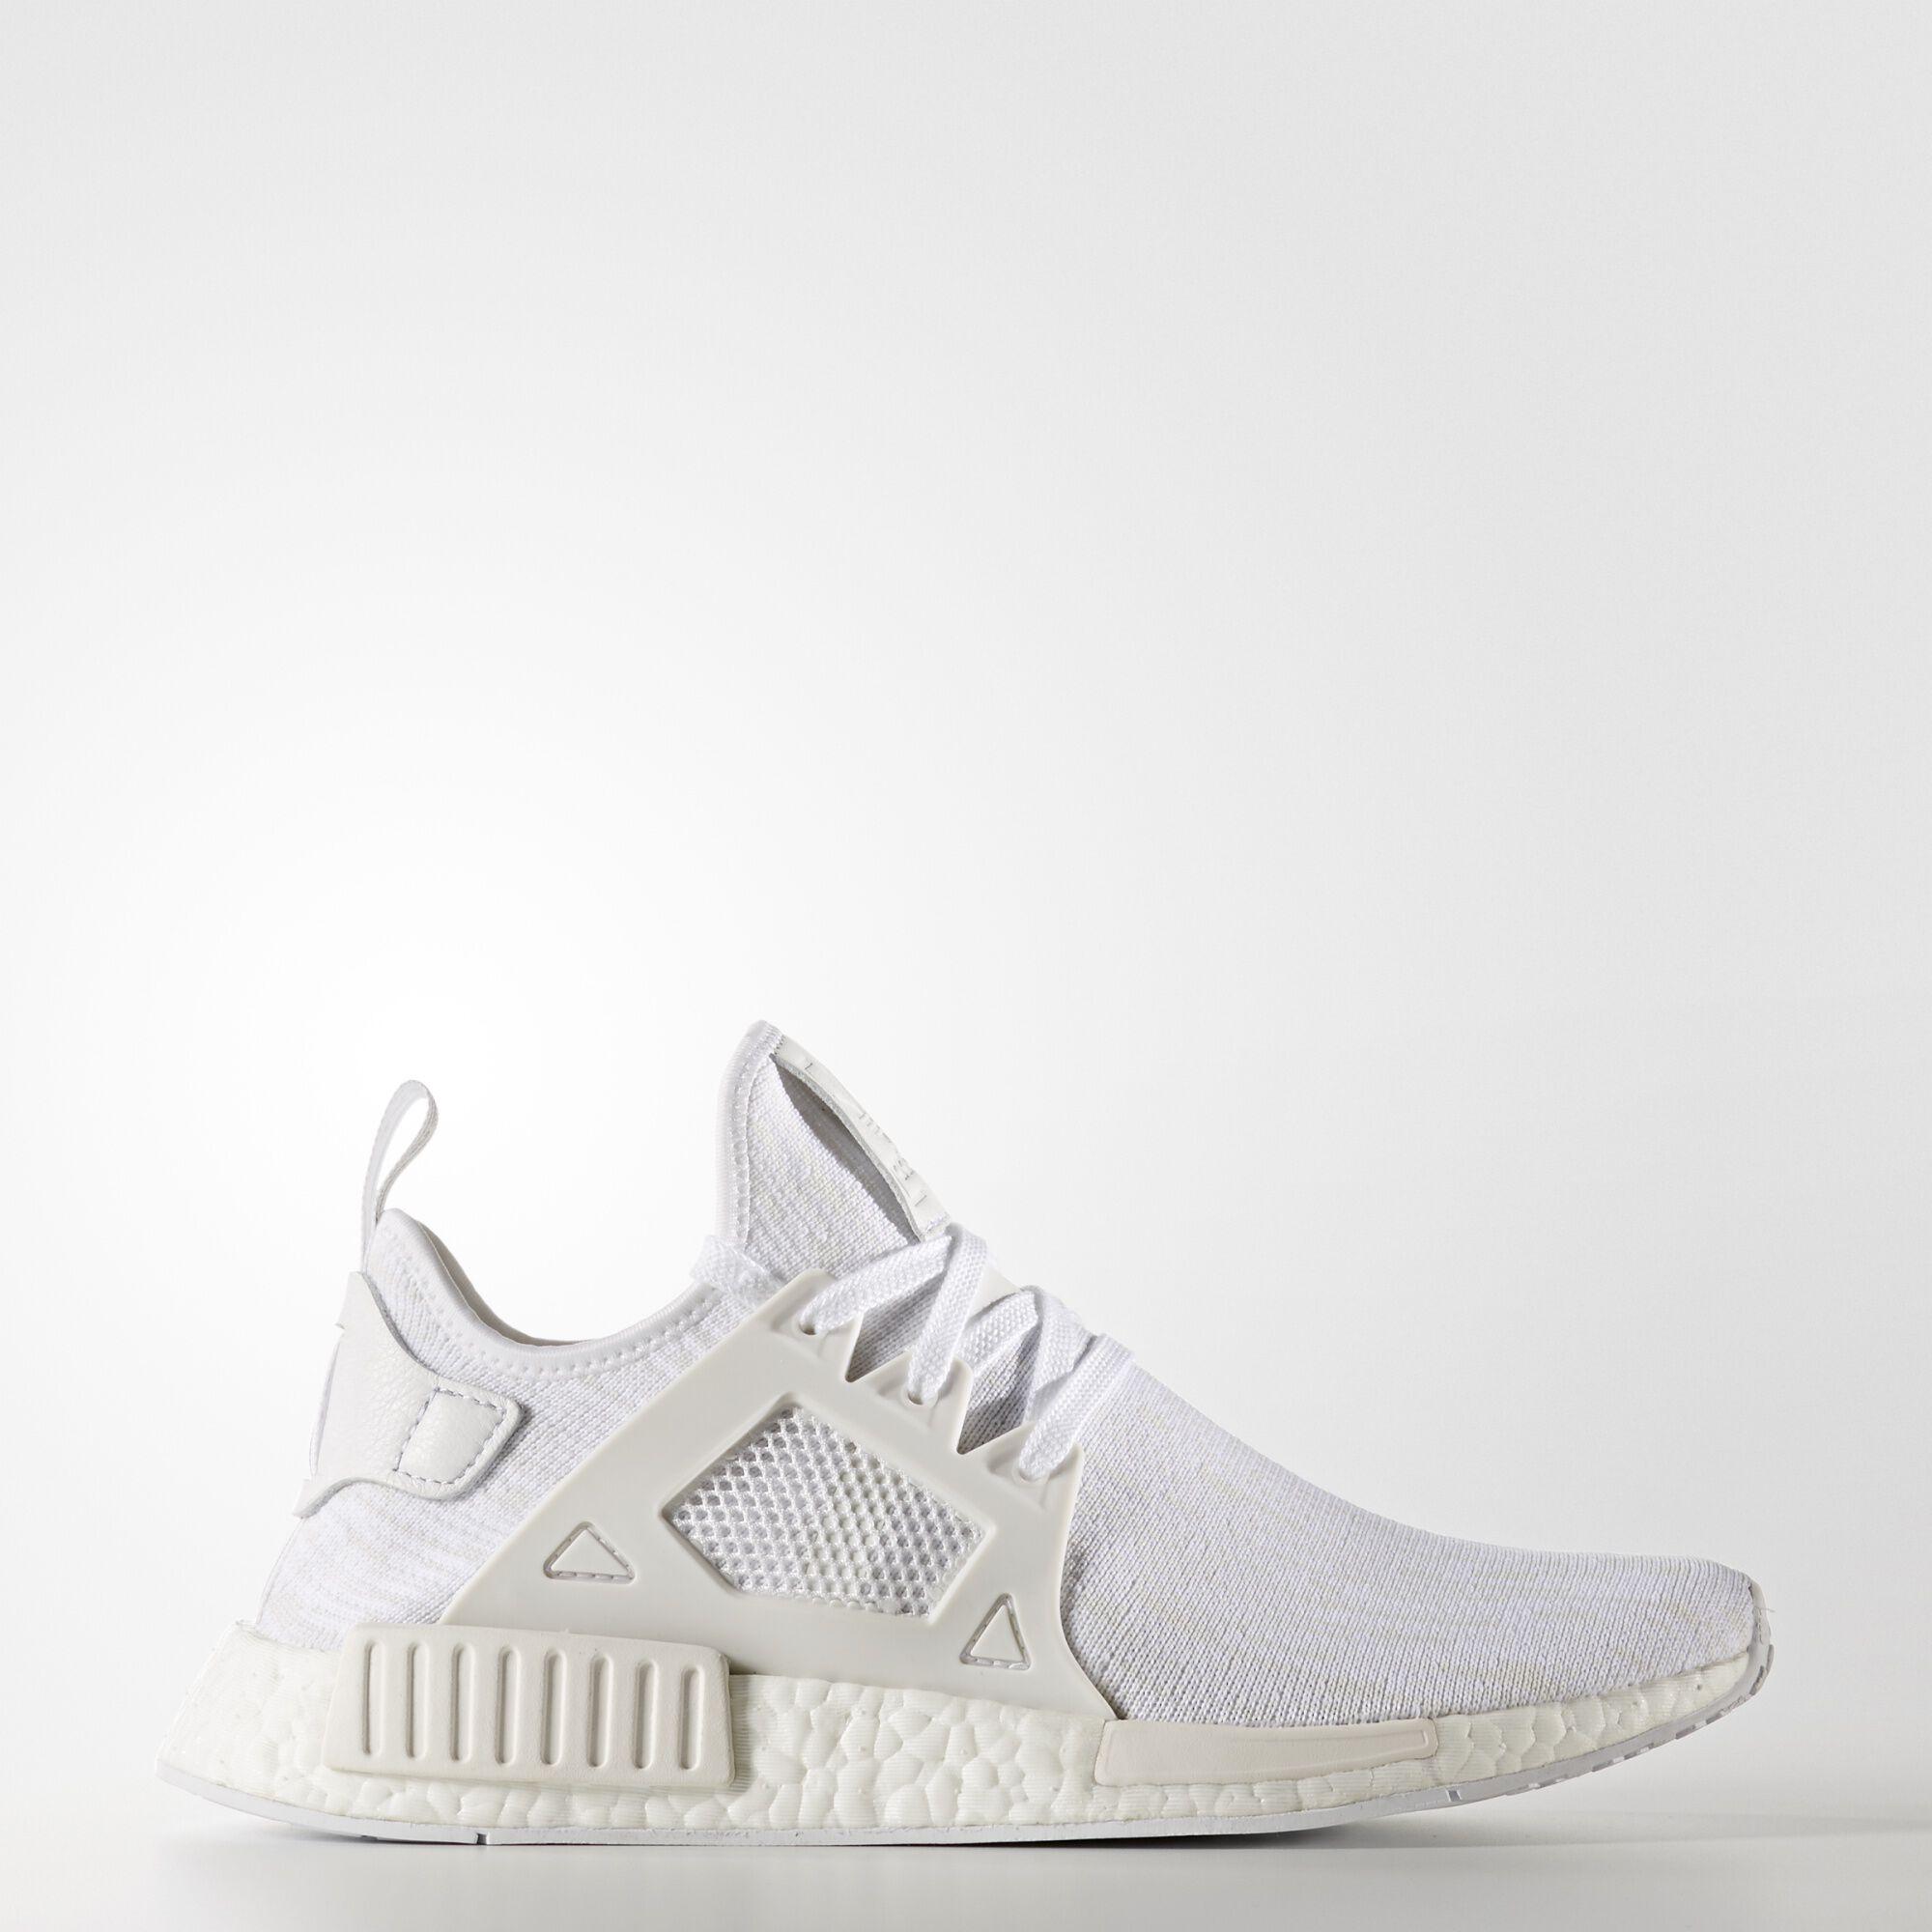 Adidas Nmd Xr1 Primeknit Triple White